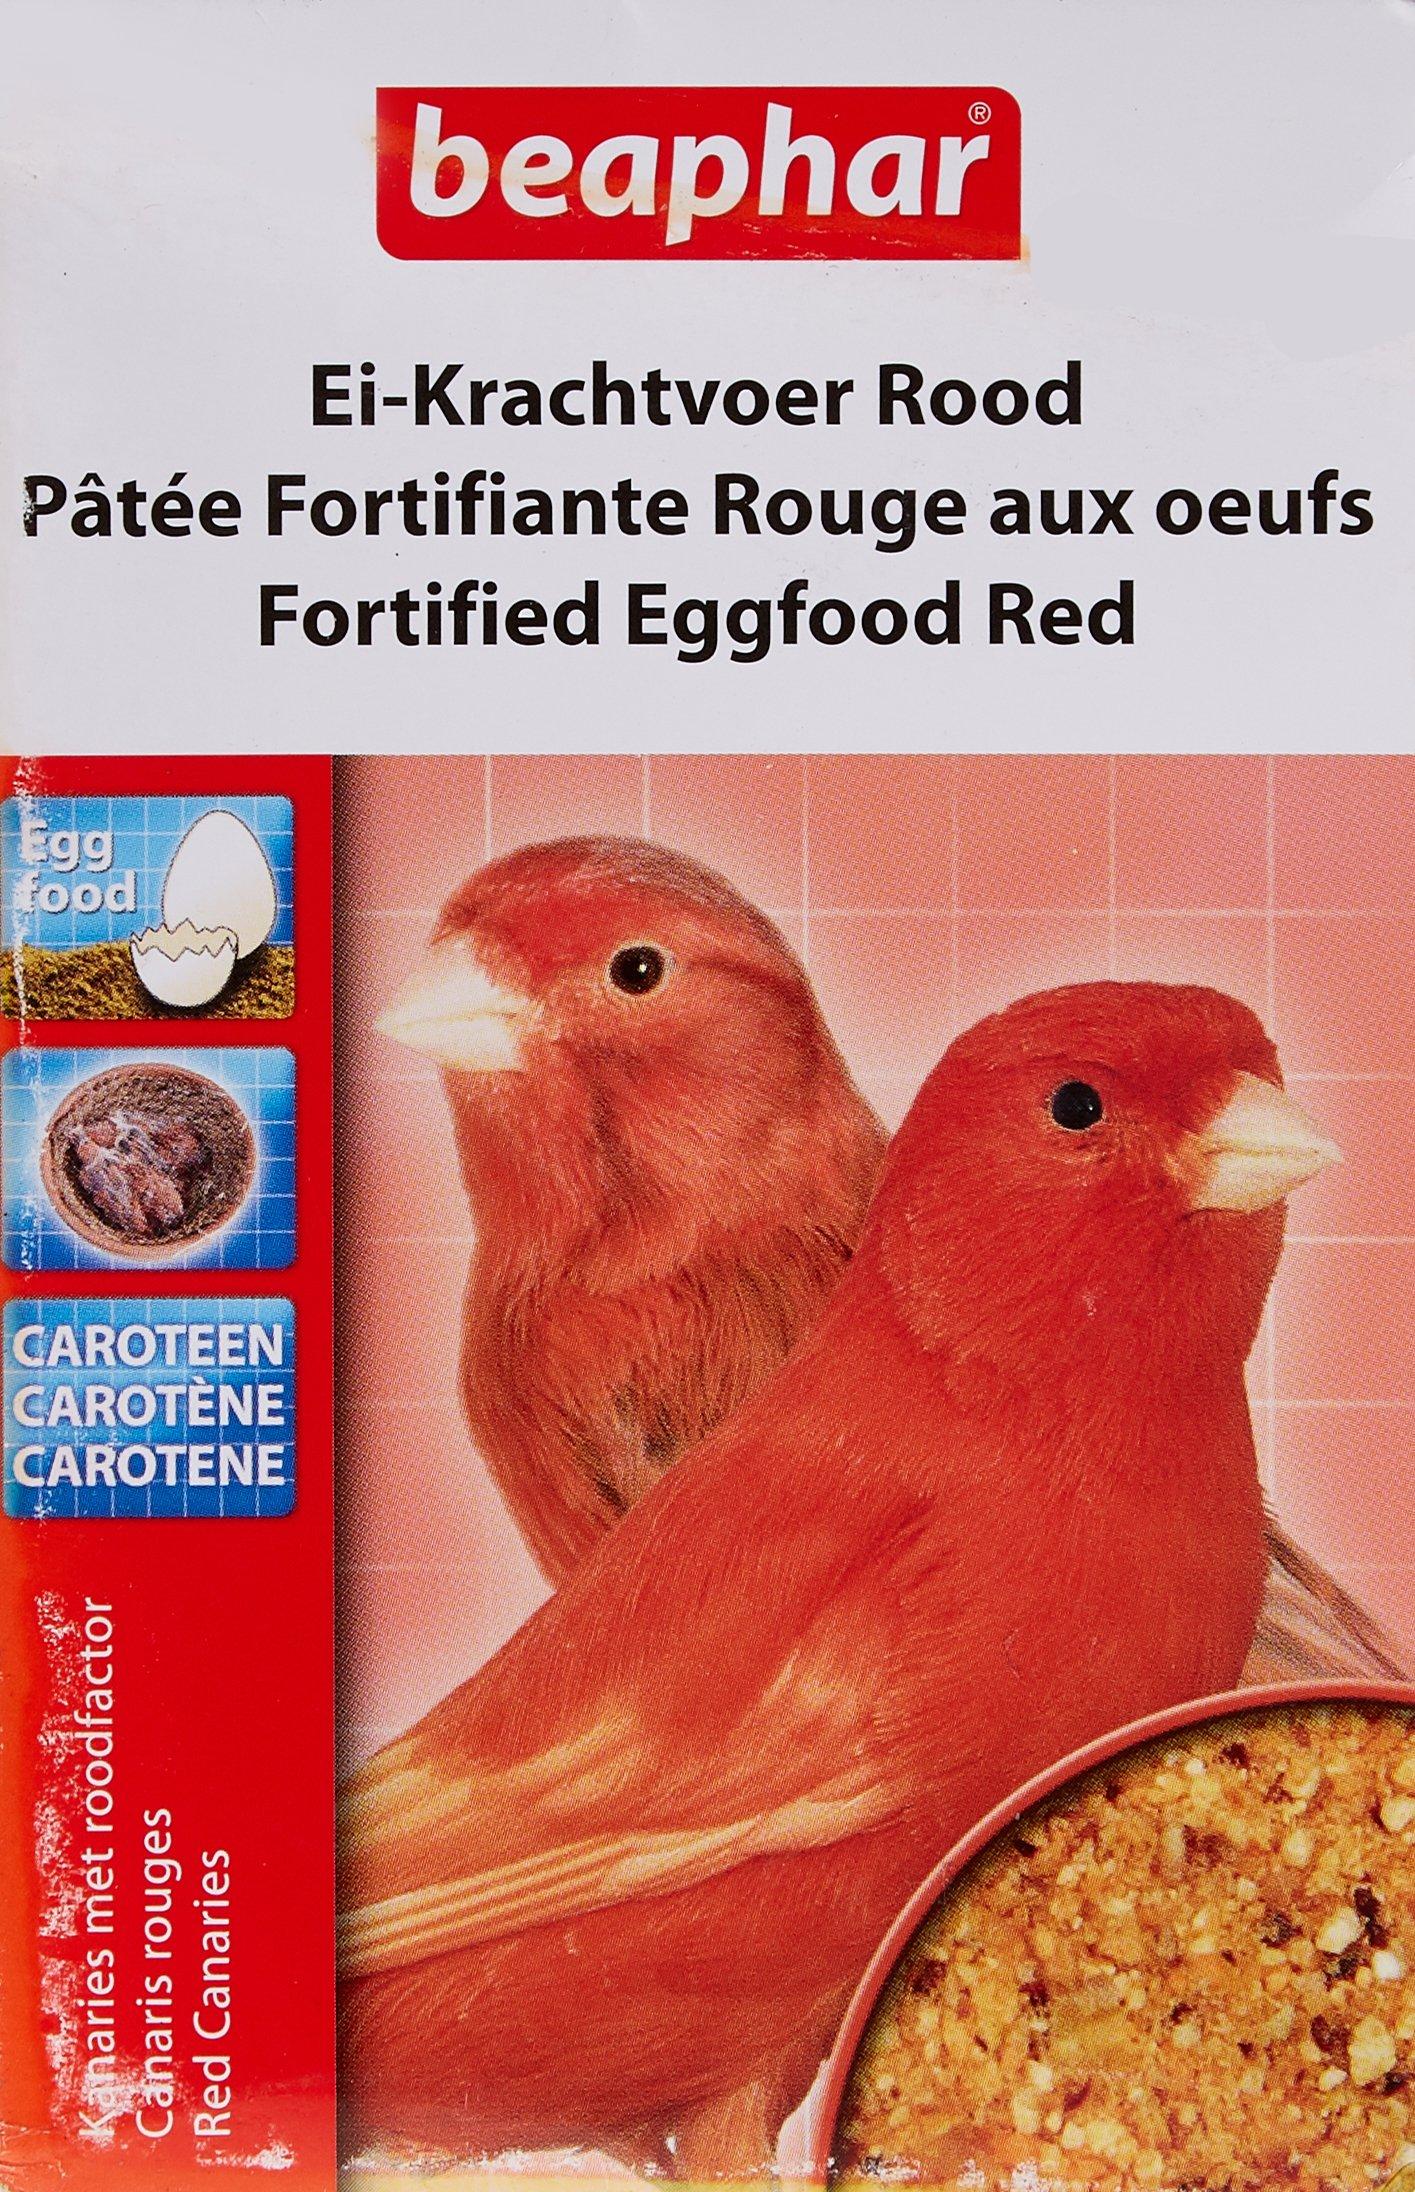 Beaphar Fortified Eggfood, 150 g, Red